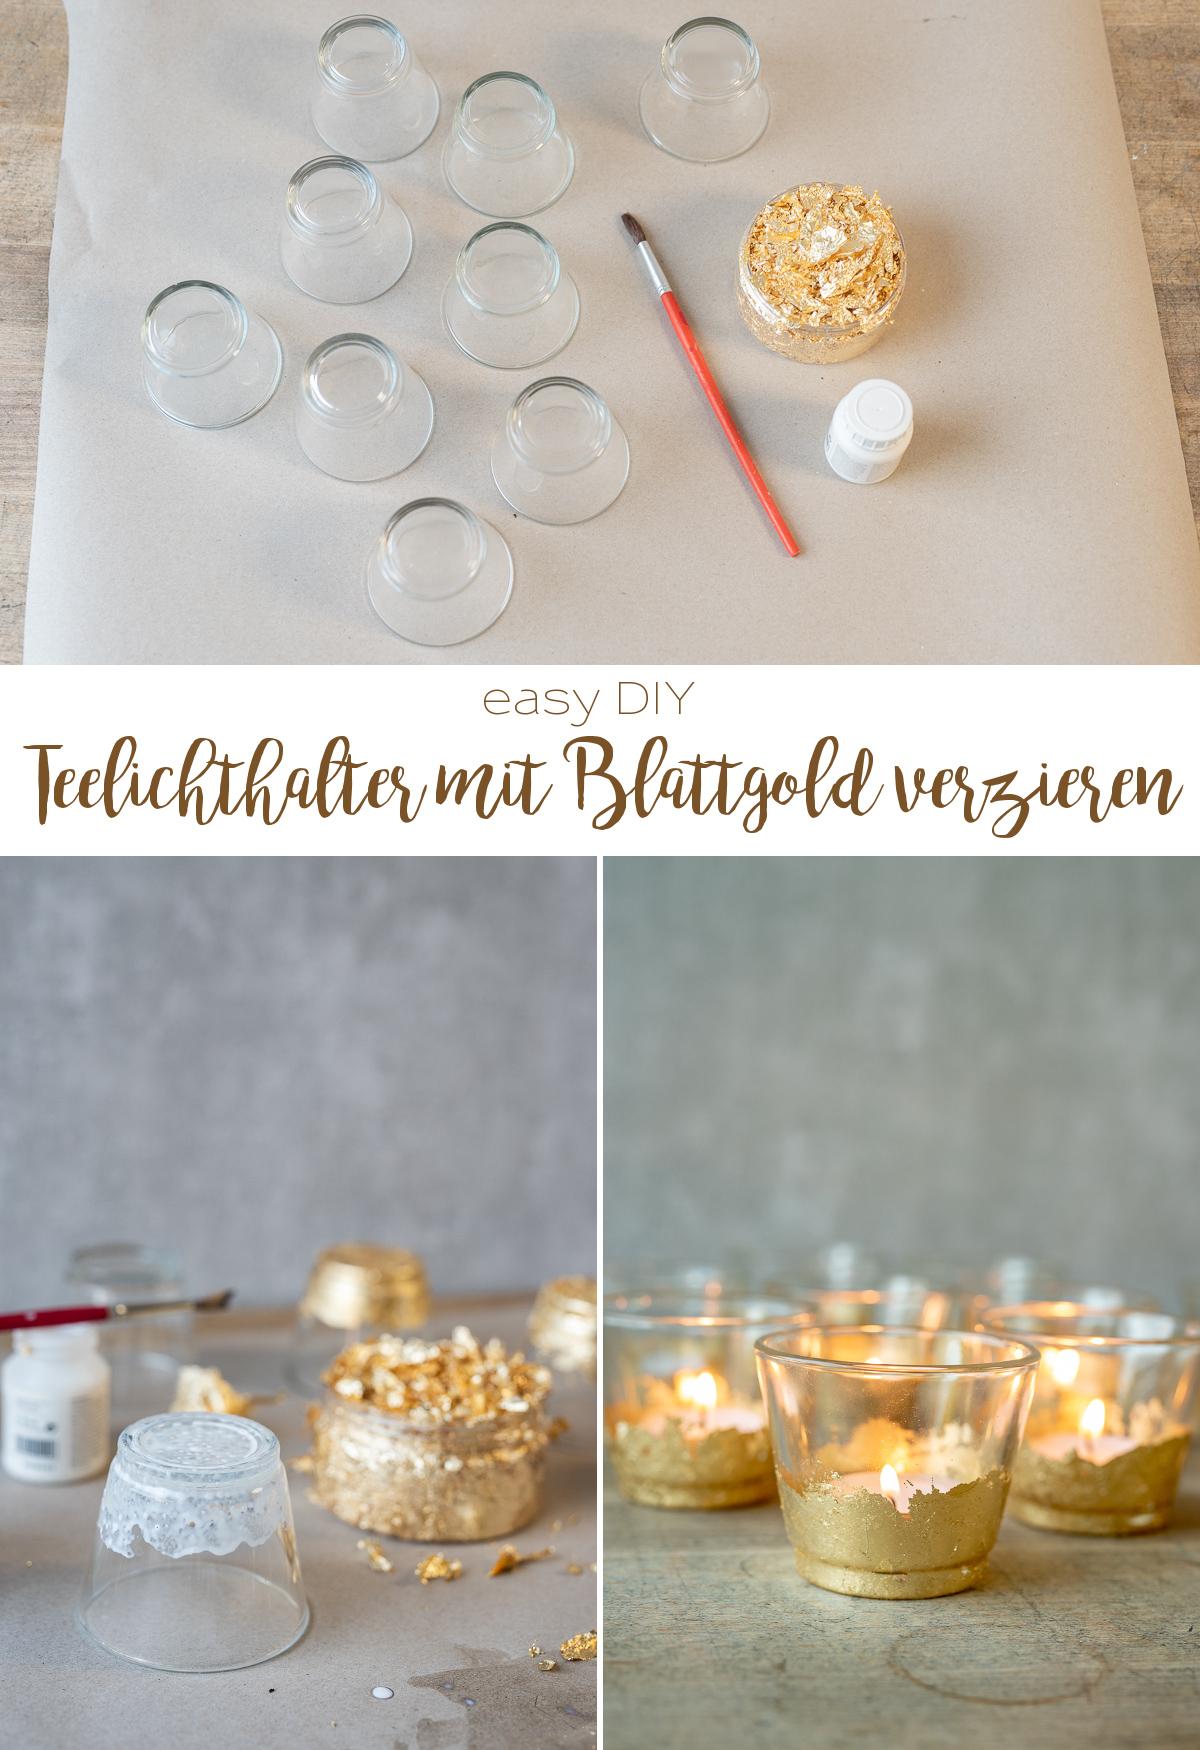 2018 10 19 Diy Hochzeitsdeko Vintage Low Budget Anleitung2 Leelah